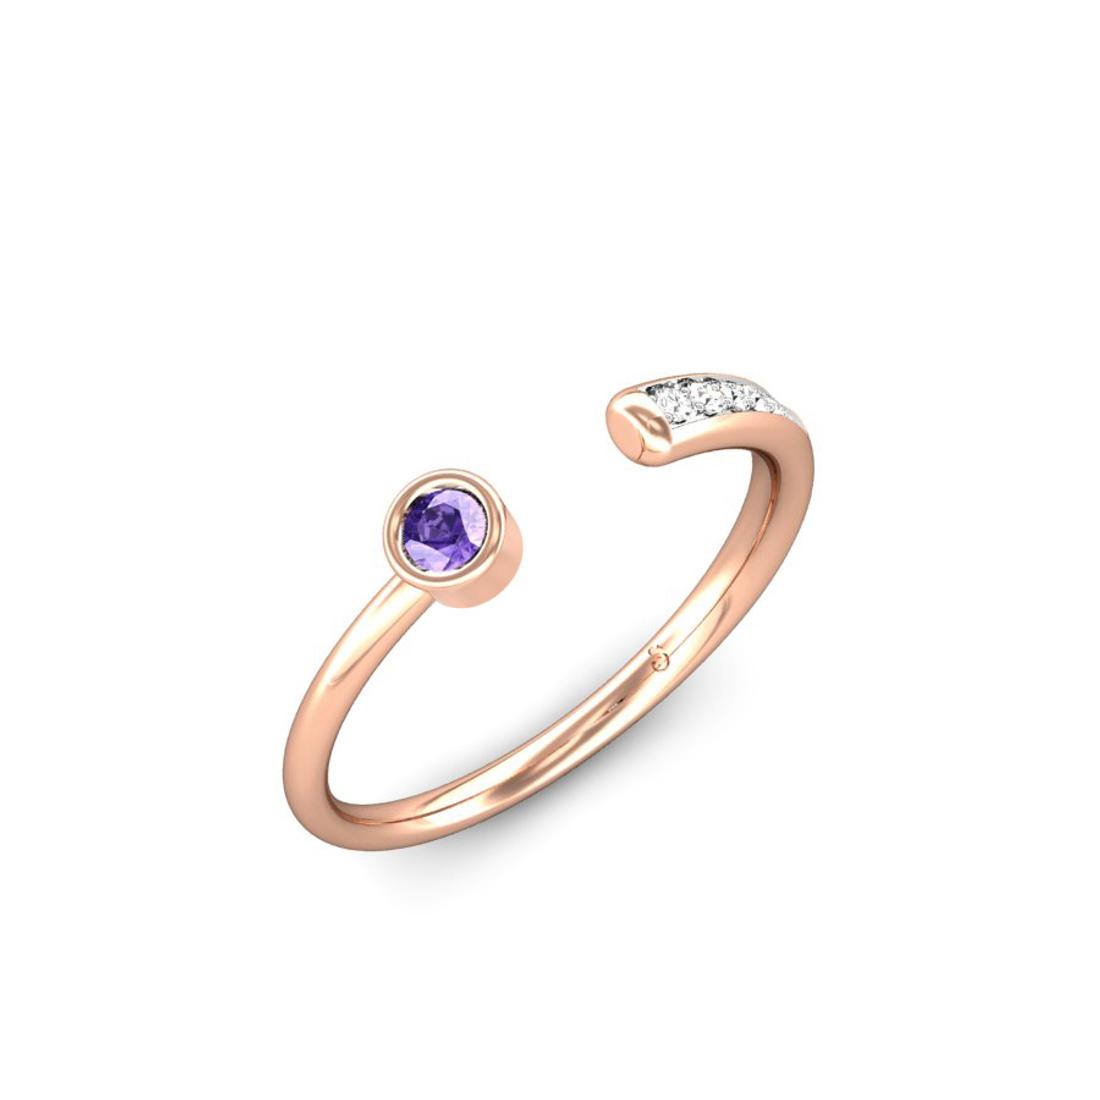 Jewel samarth 18k(750) BIS Hallmark Rose Gold Sparkling Trail Tanzanite Ring (CGL Certified)